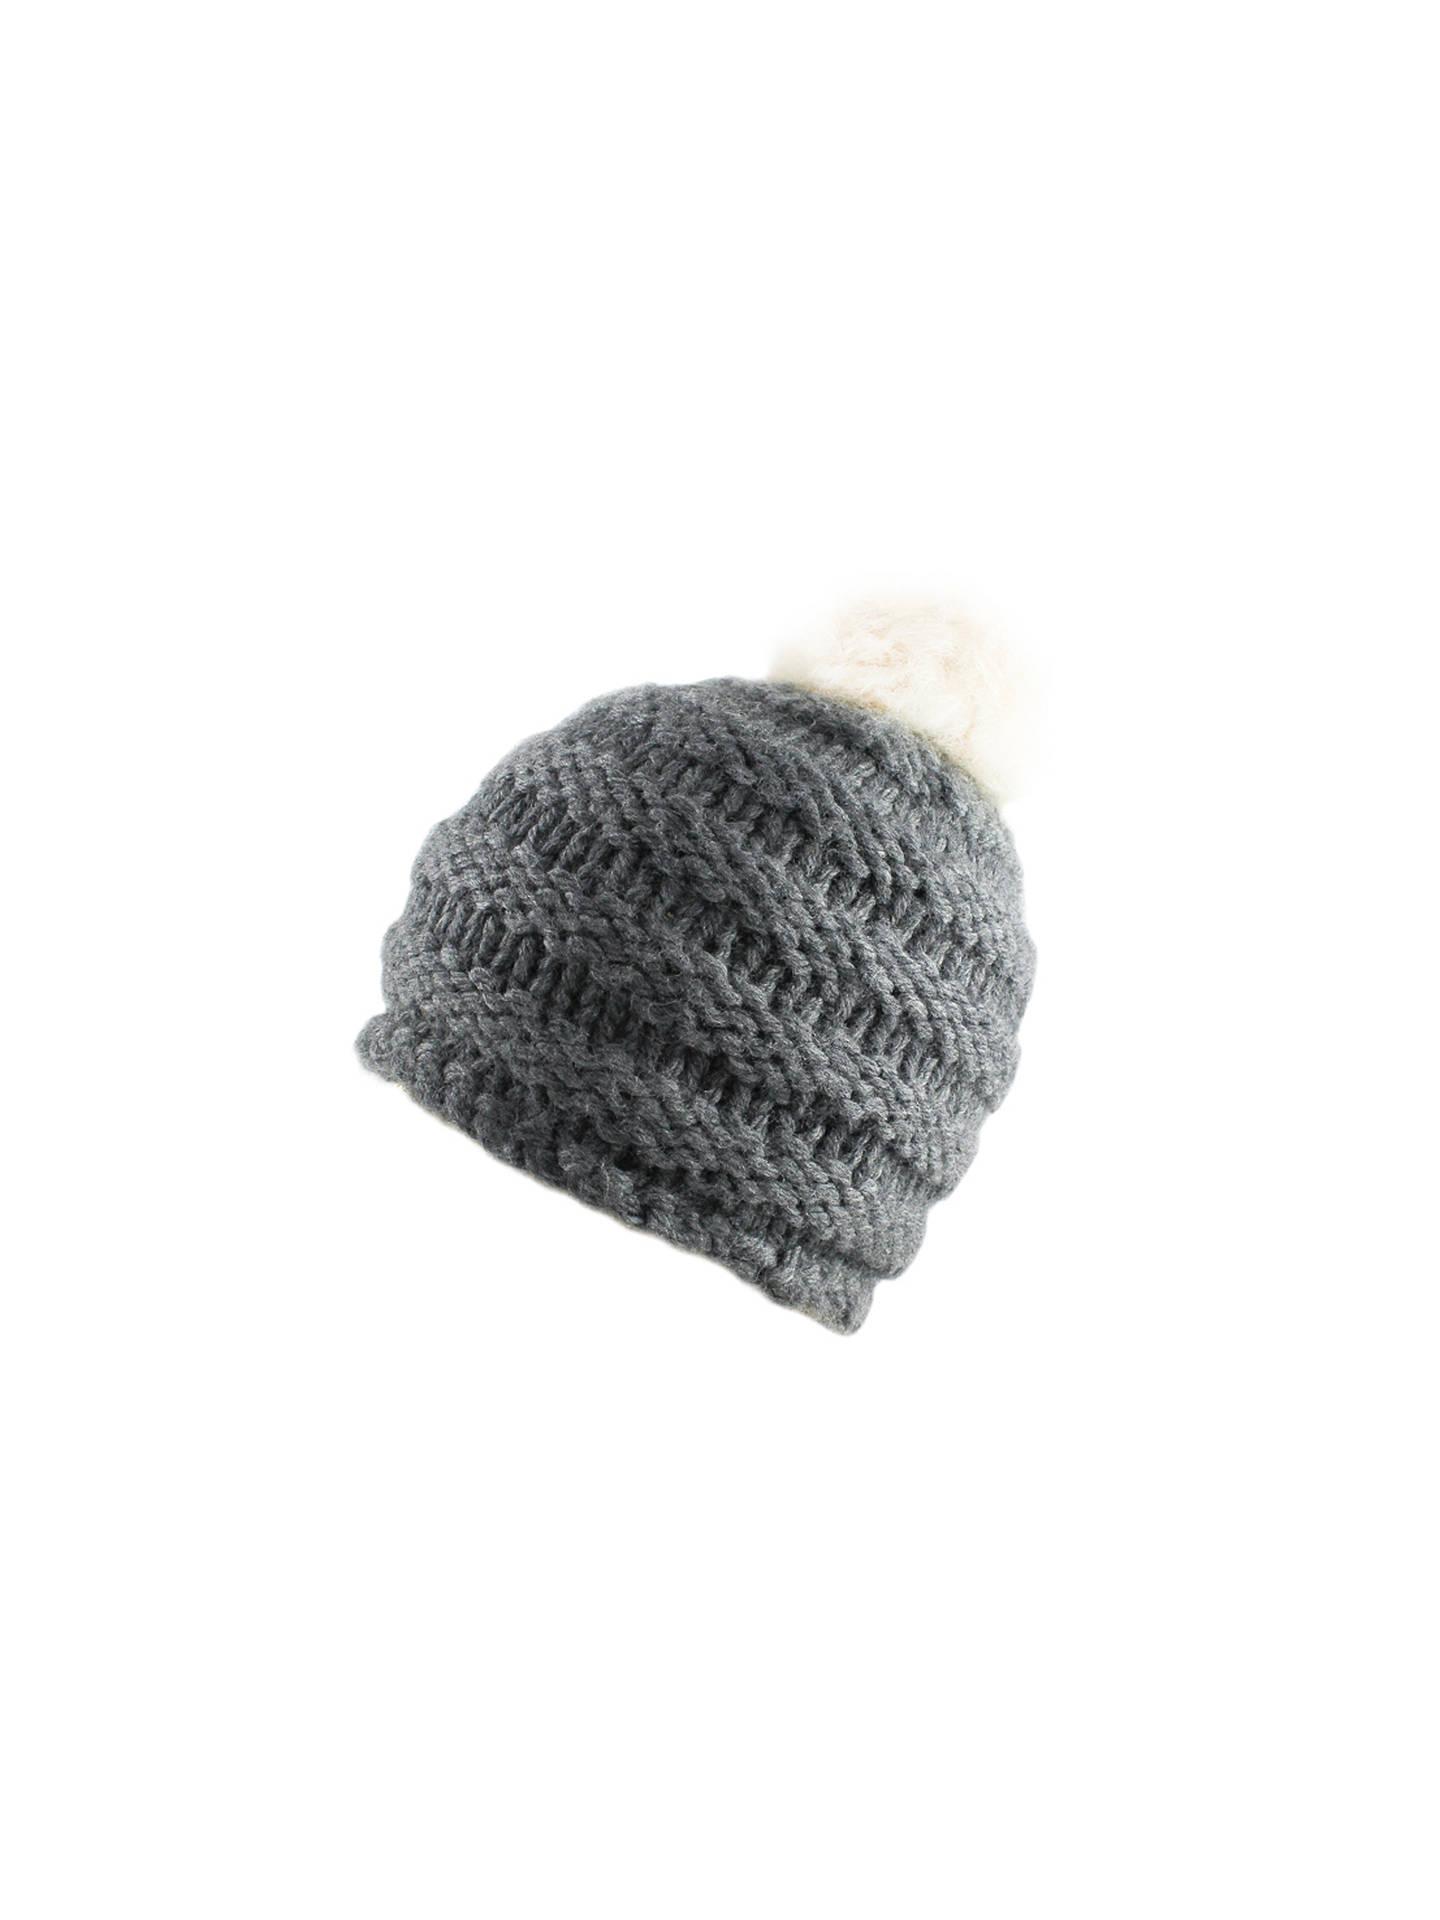 c9381e524 Toft Strata Hat Knitting Kit at John Lewis & Partners